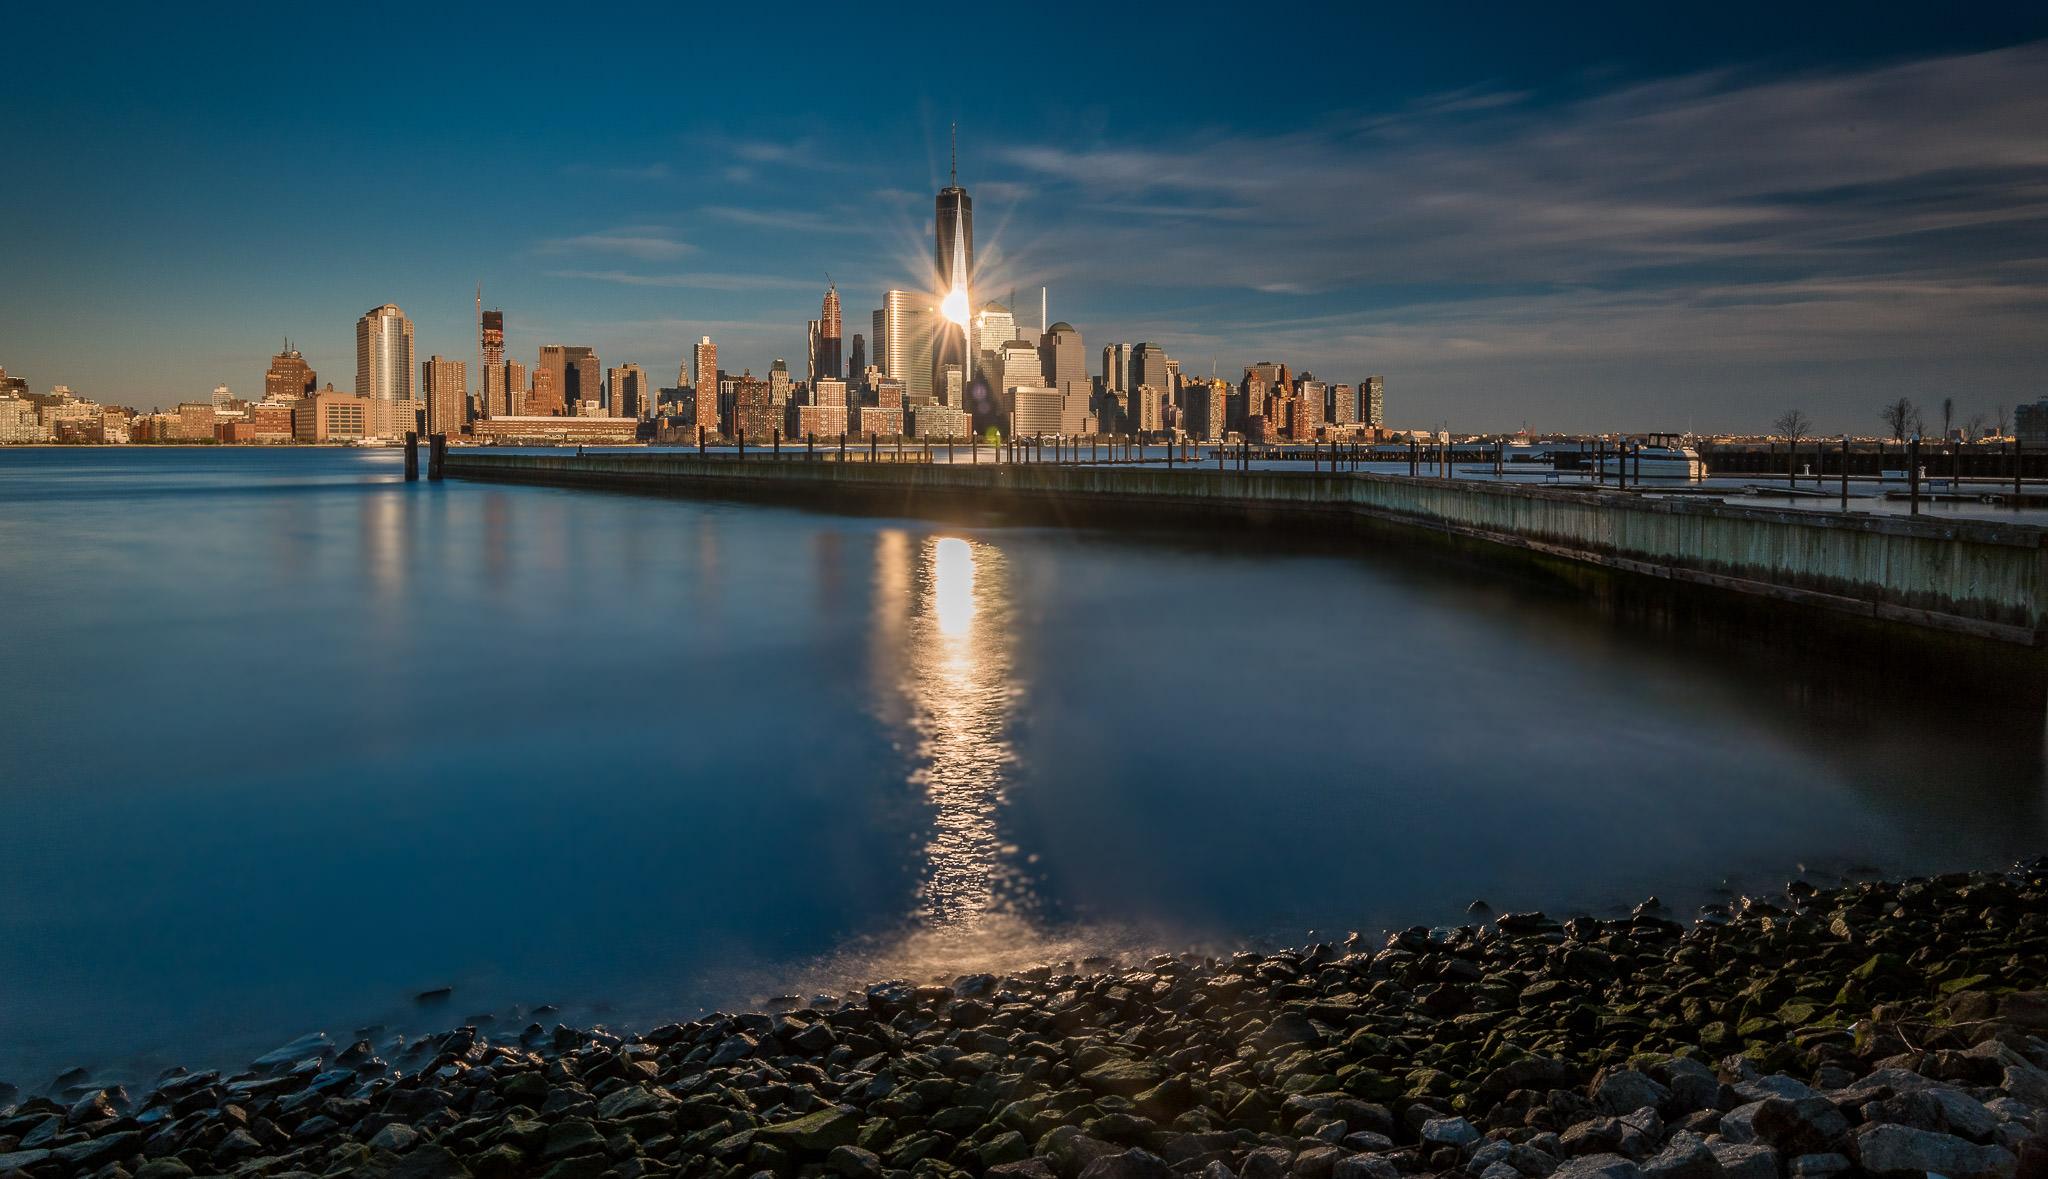 Hudson River Water Front Walkway - Best Photo Spots